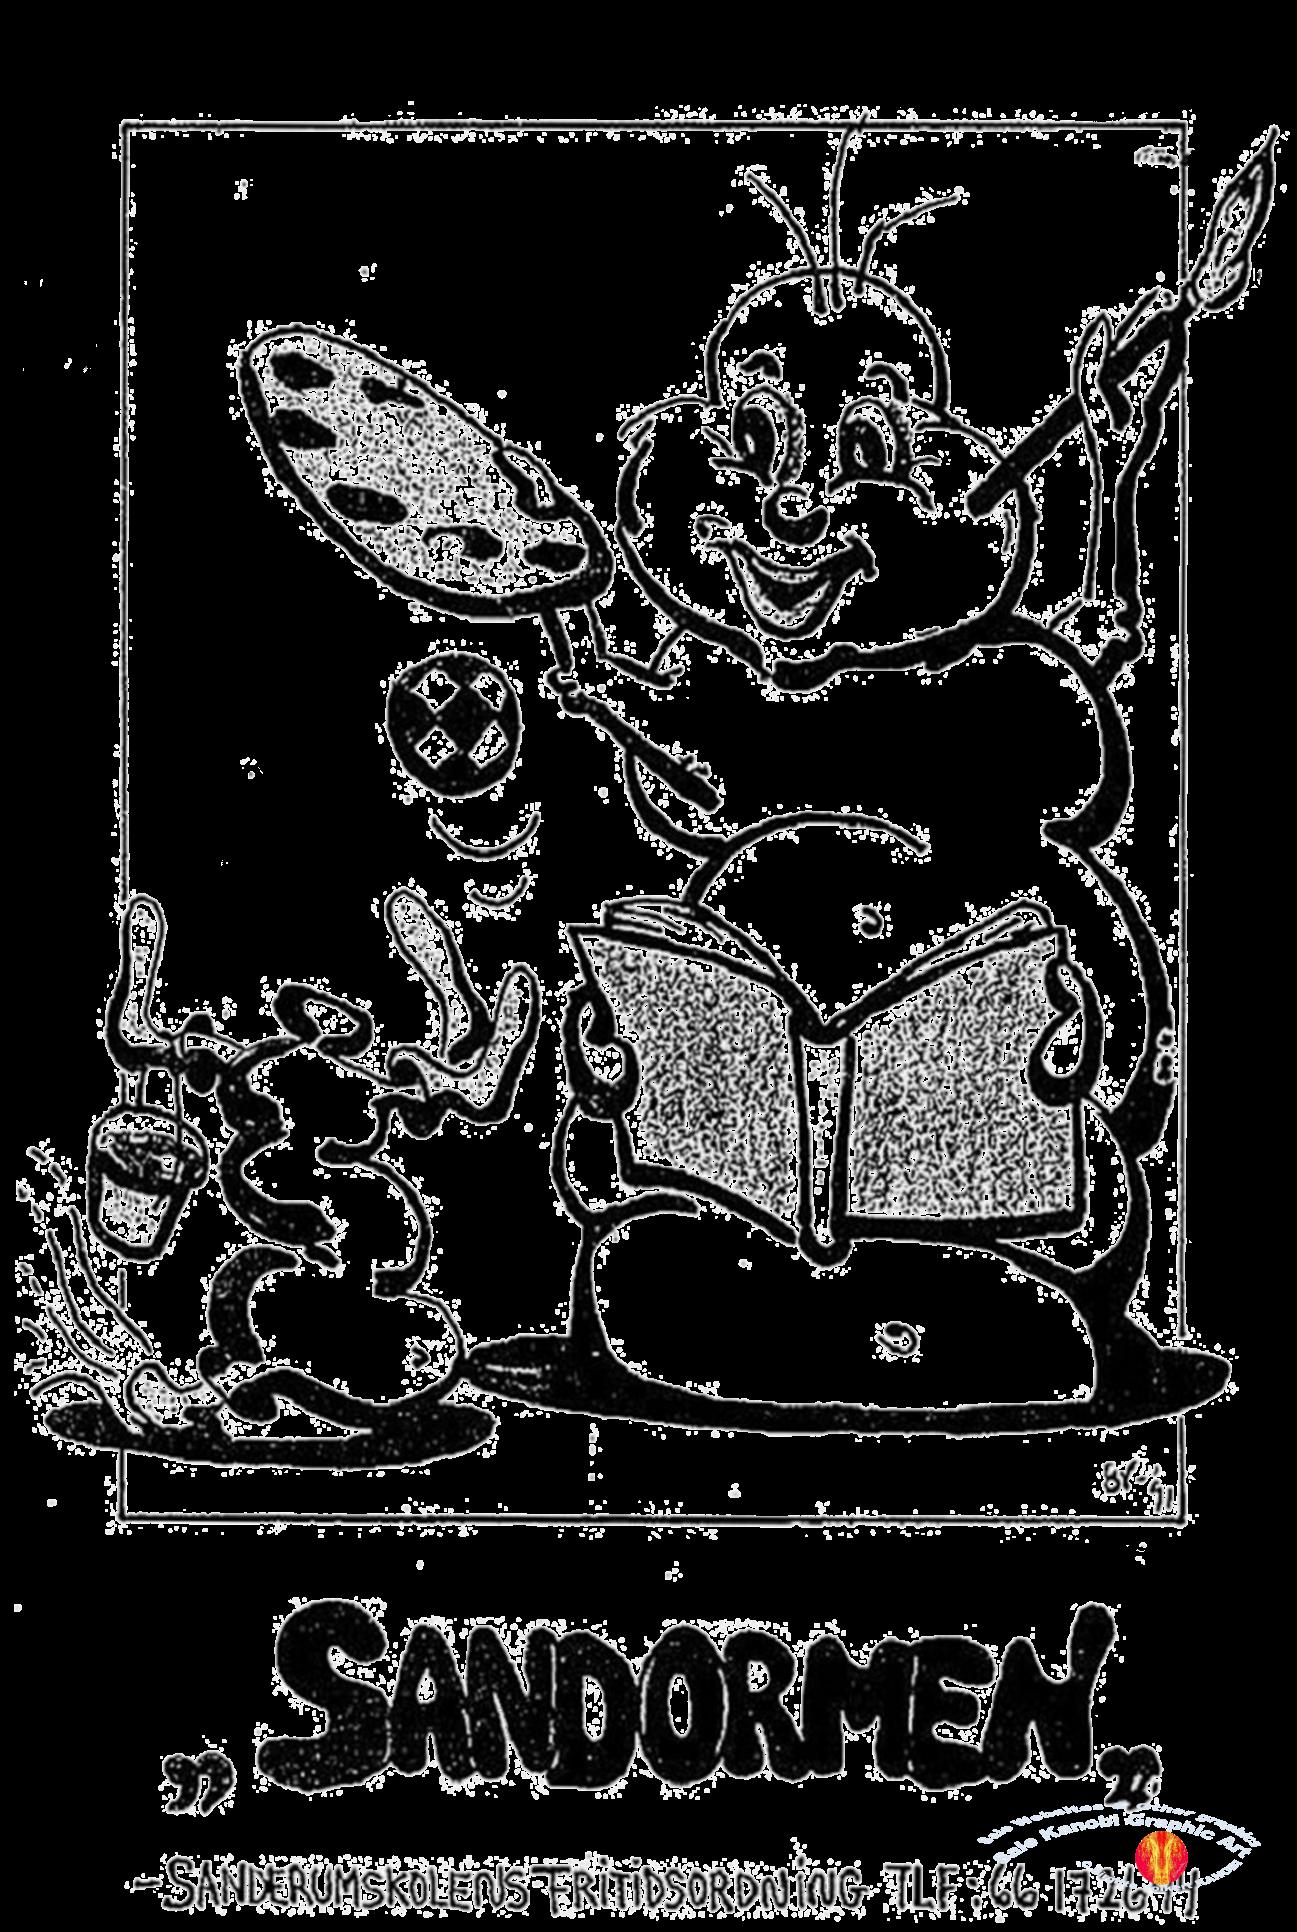 Forside månedsblad Sandormen Kanobi R